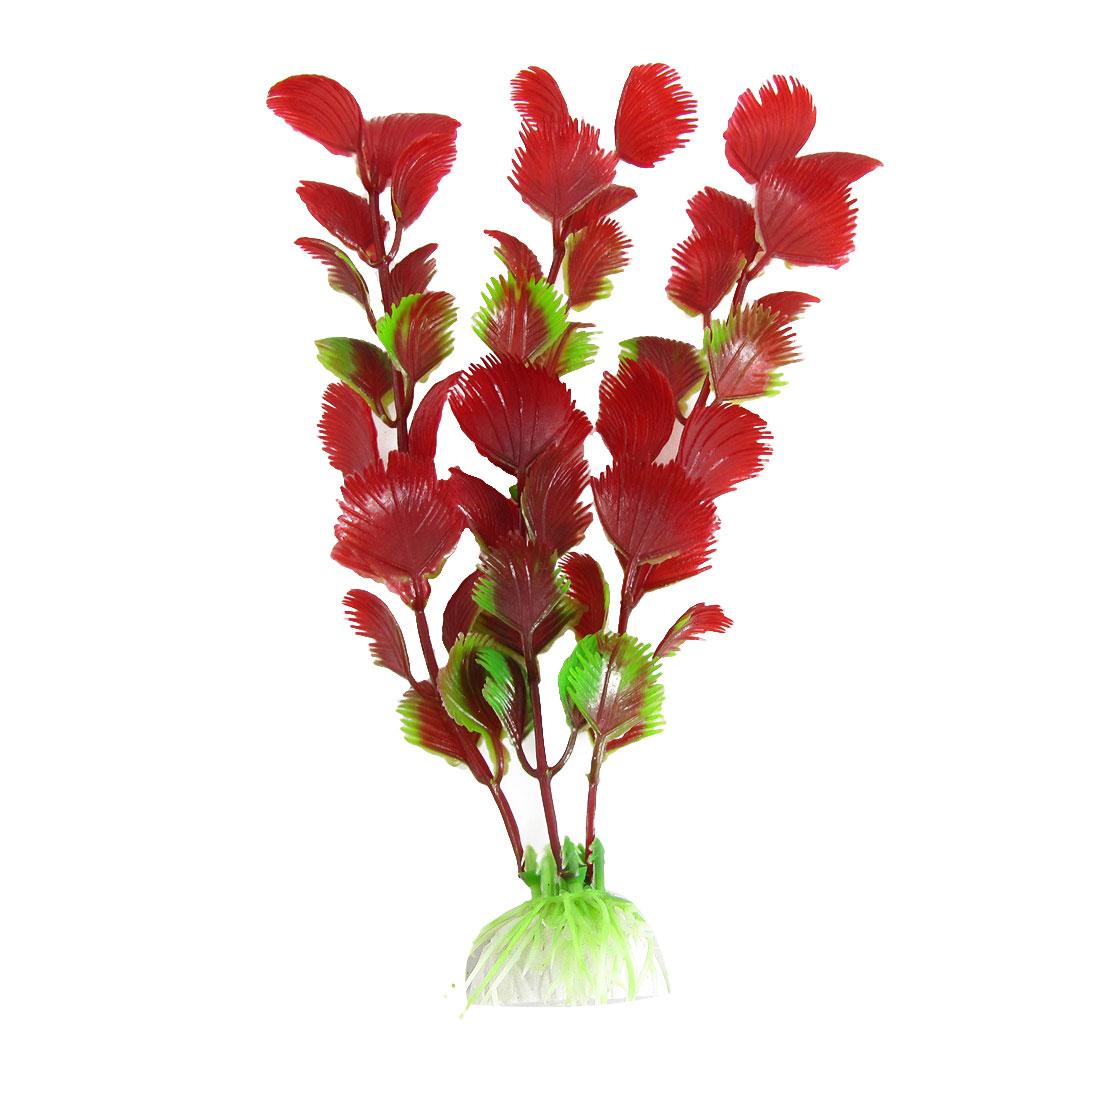 Red Green Emulational Plastic Water Plants Ornament for Aquarium